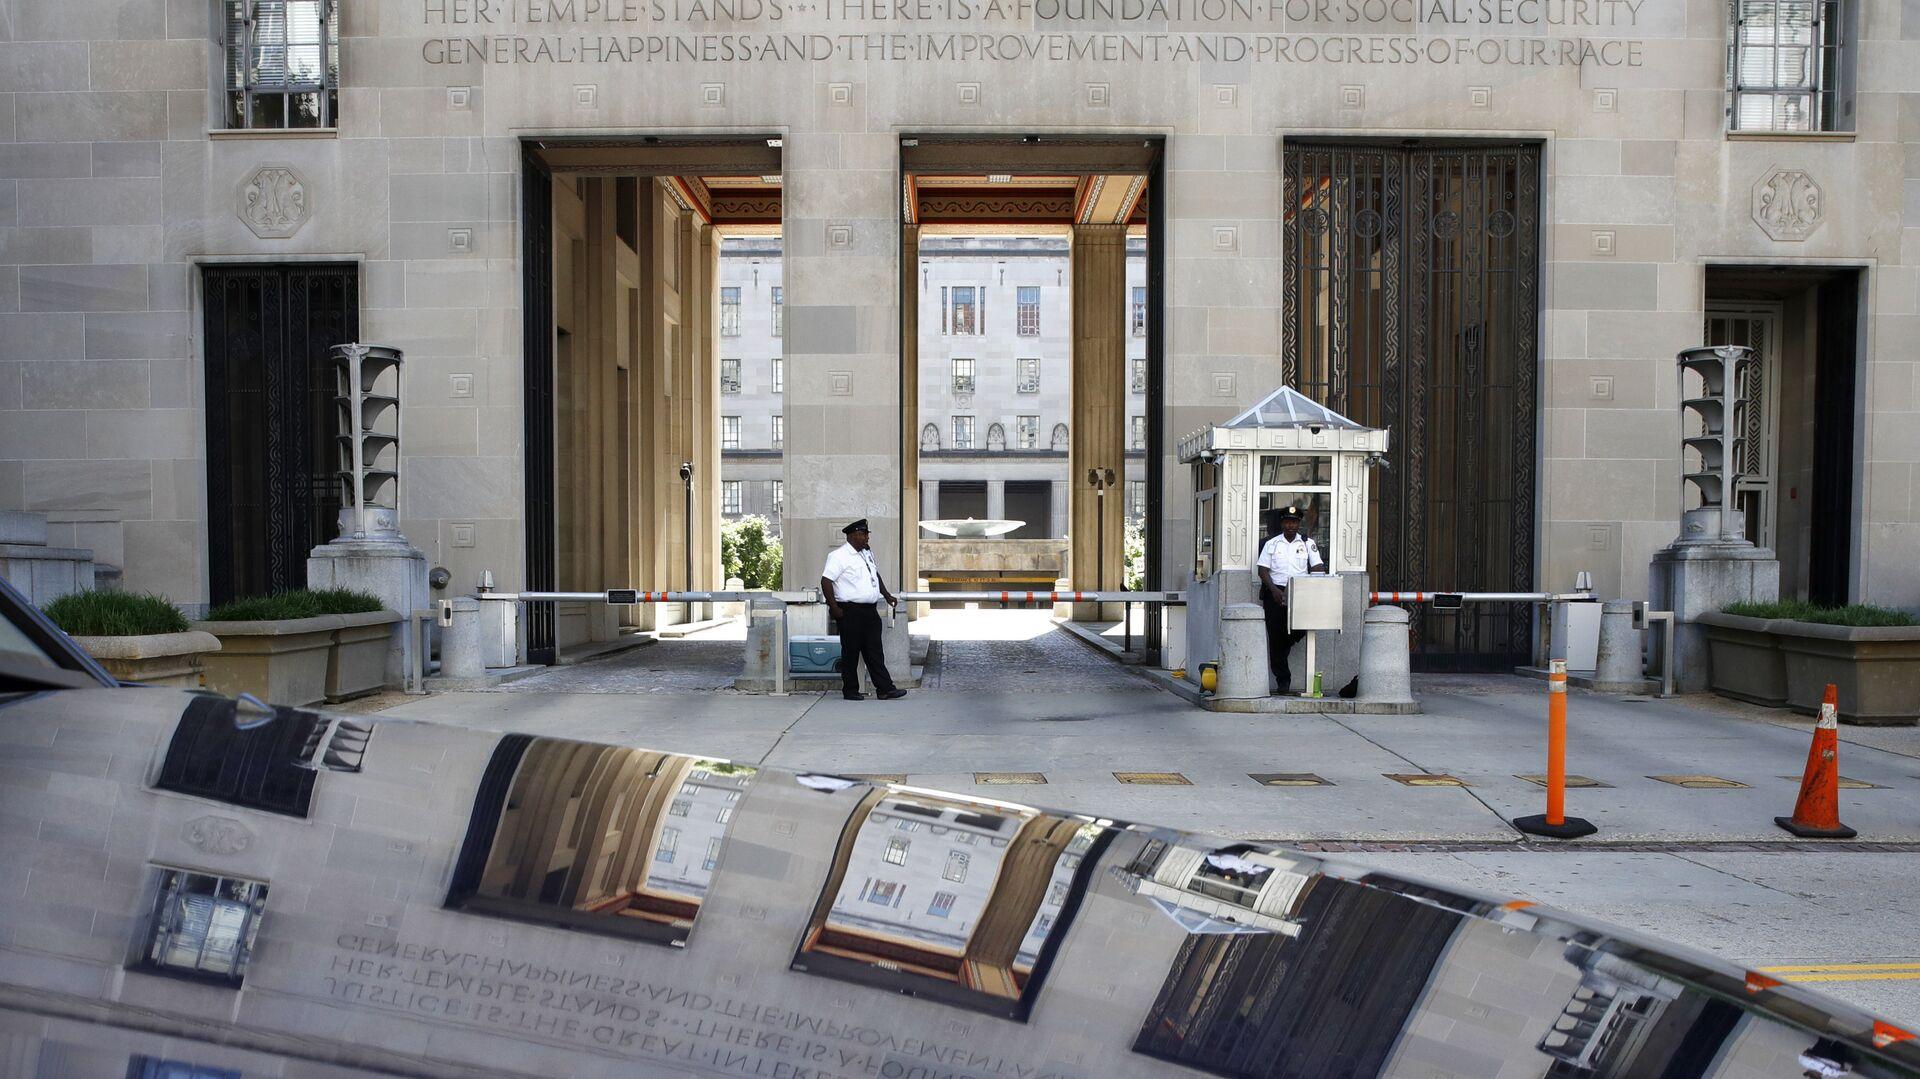 Сотрудники службы безопасности перед зданием Министерства Юстиции США - РИА Новости, 1920, 15.06.2021